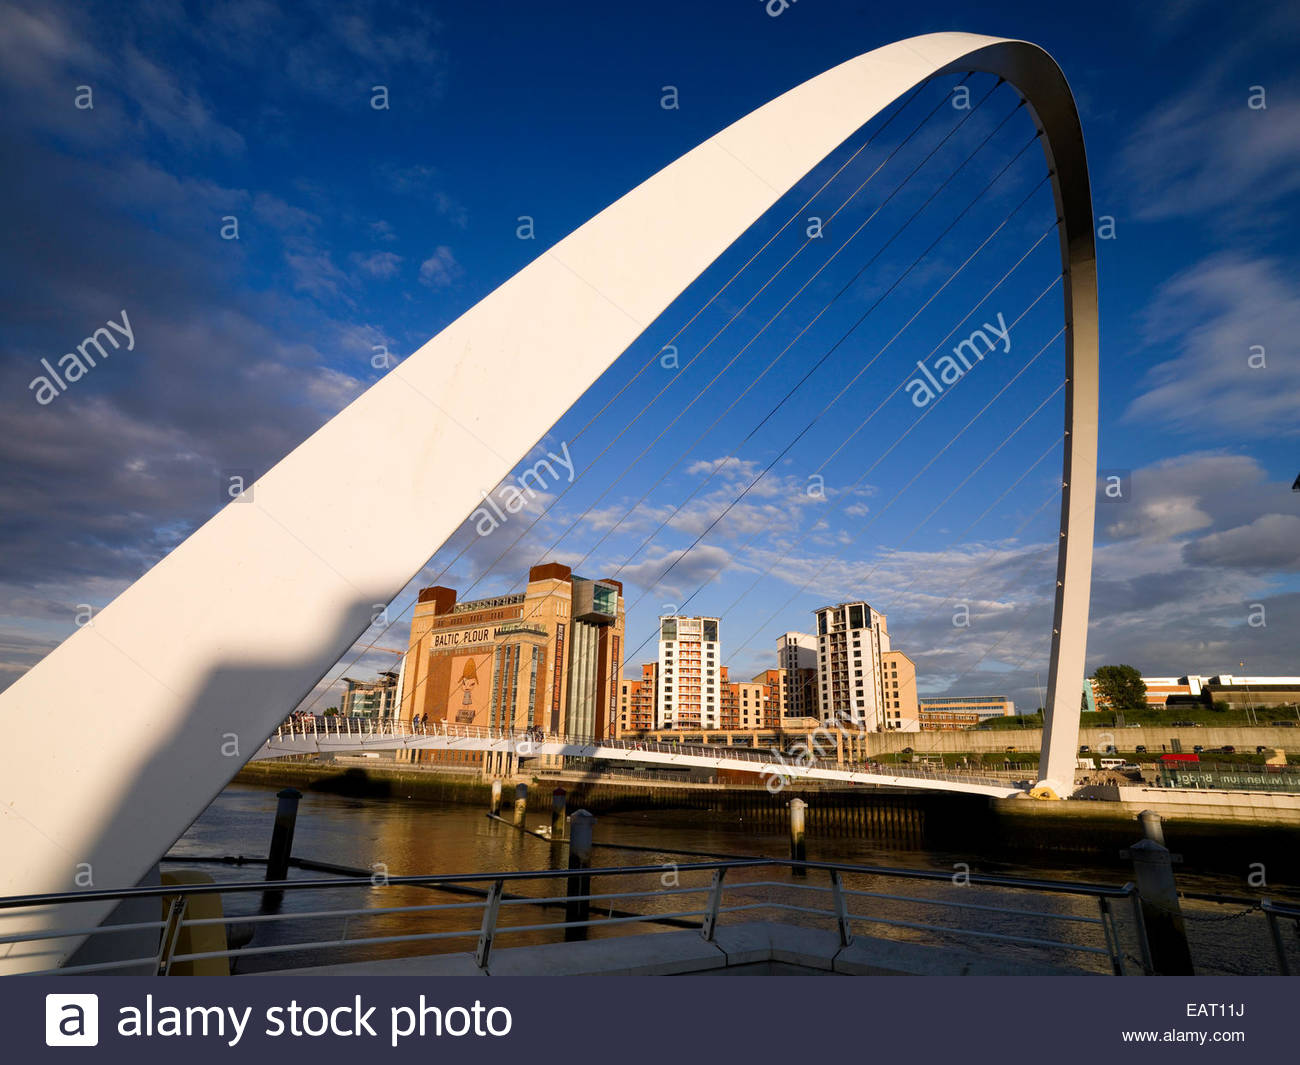 Gateshead Millennium Bridge, Newcastle Upon Tyne in England. - Stock Image